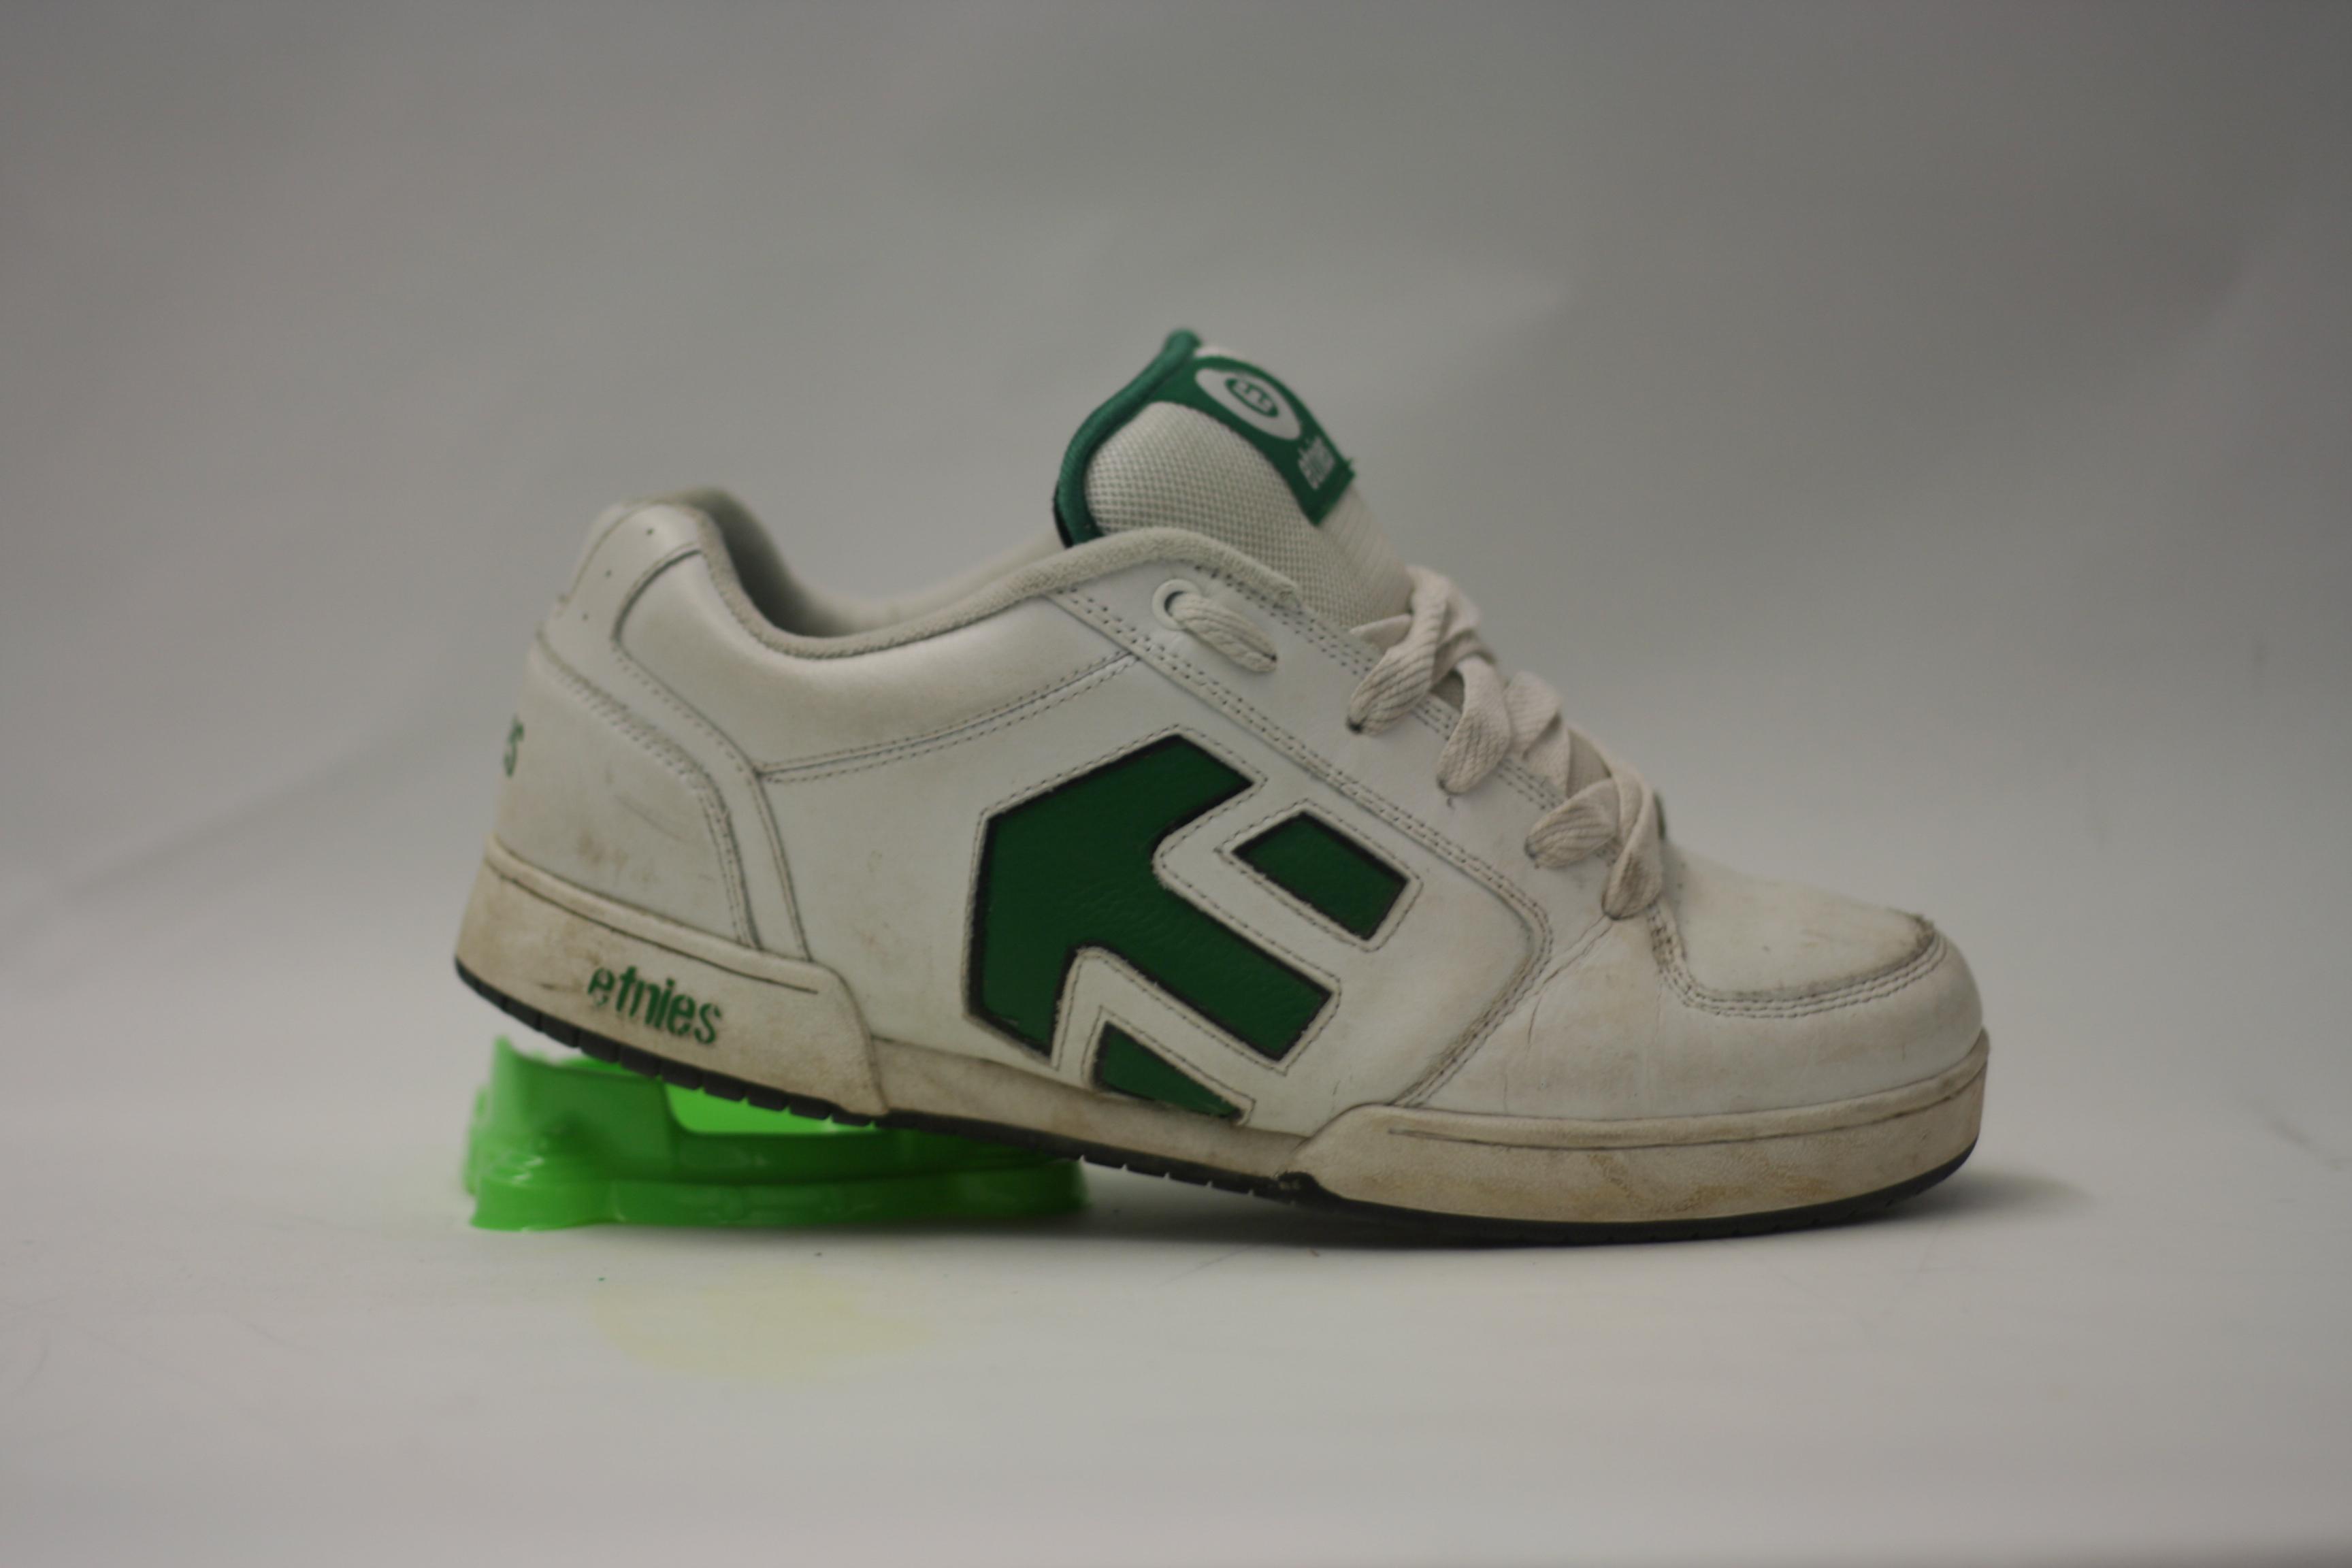 vans tennis shoes wikipedia